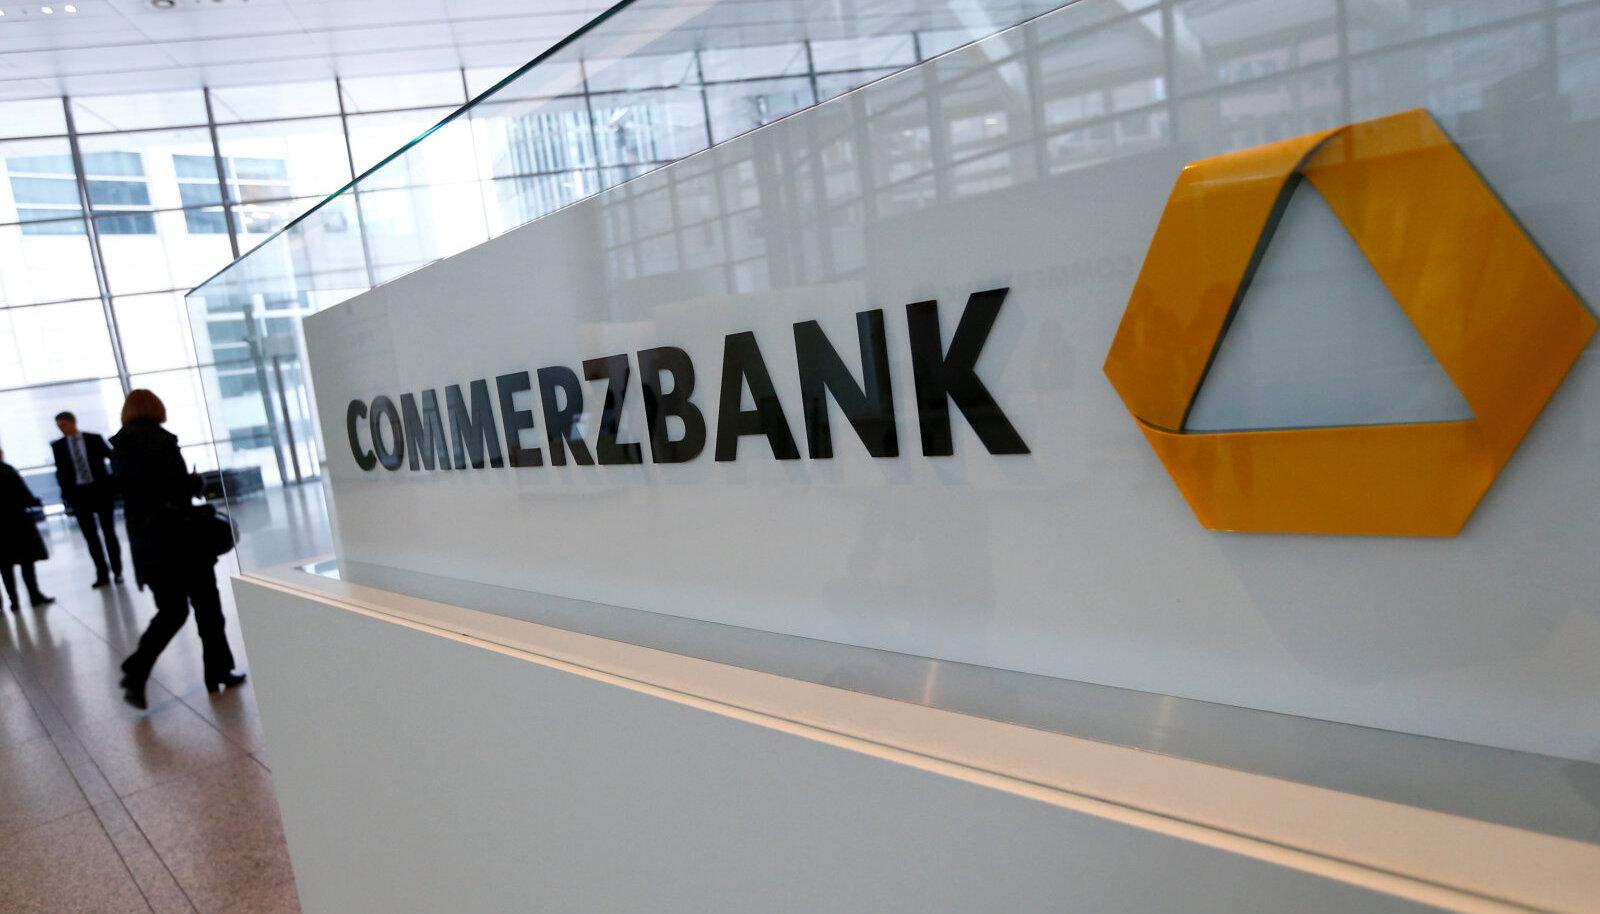 Commerzbanki logo